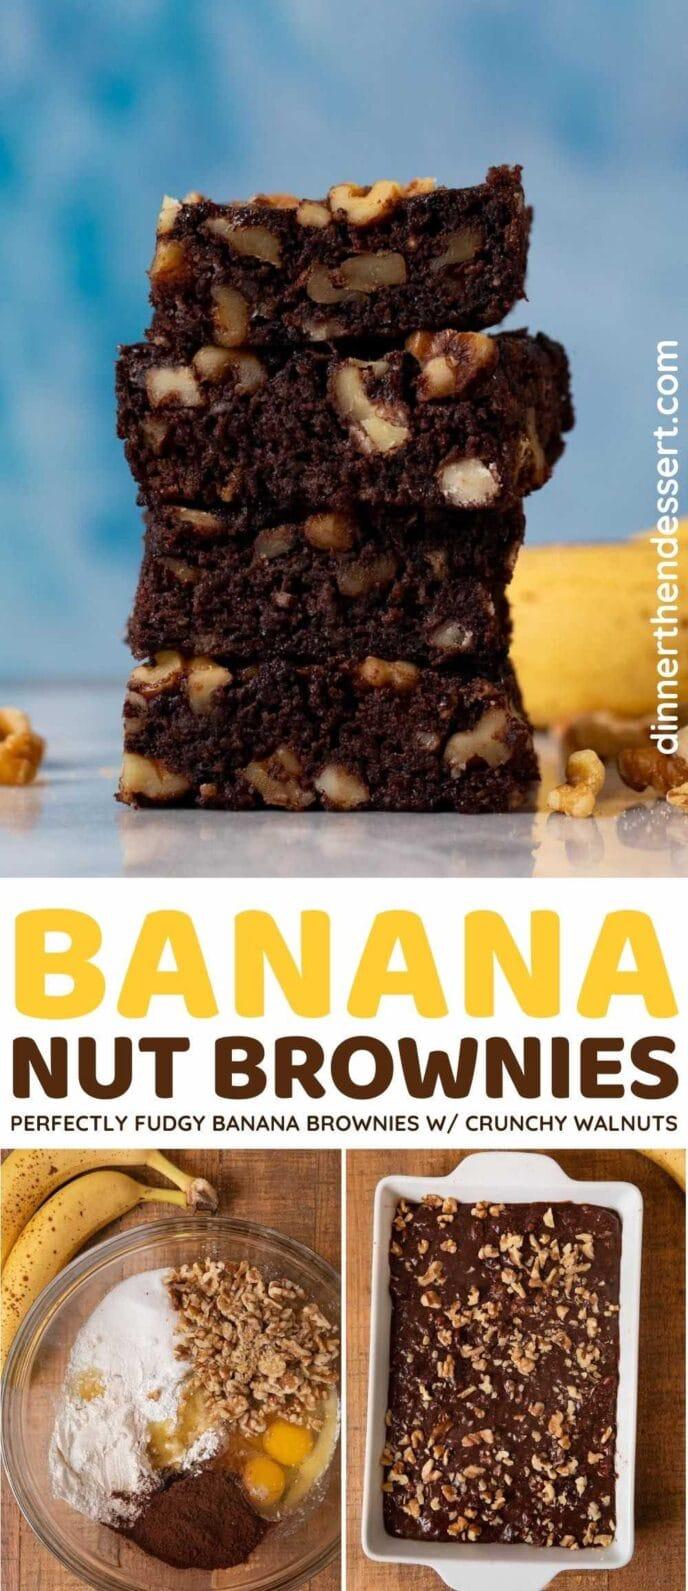 Banana Nut Brownies collage